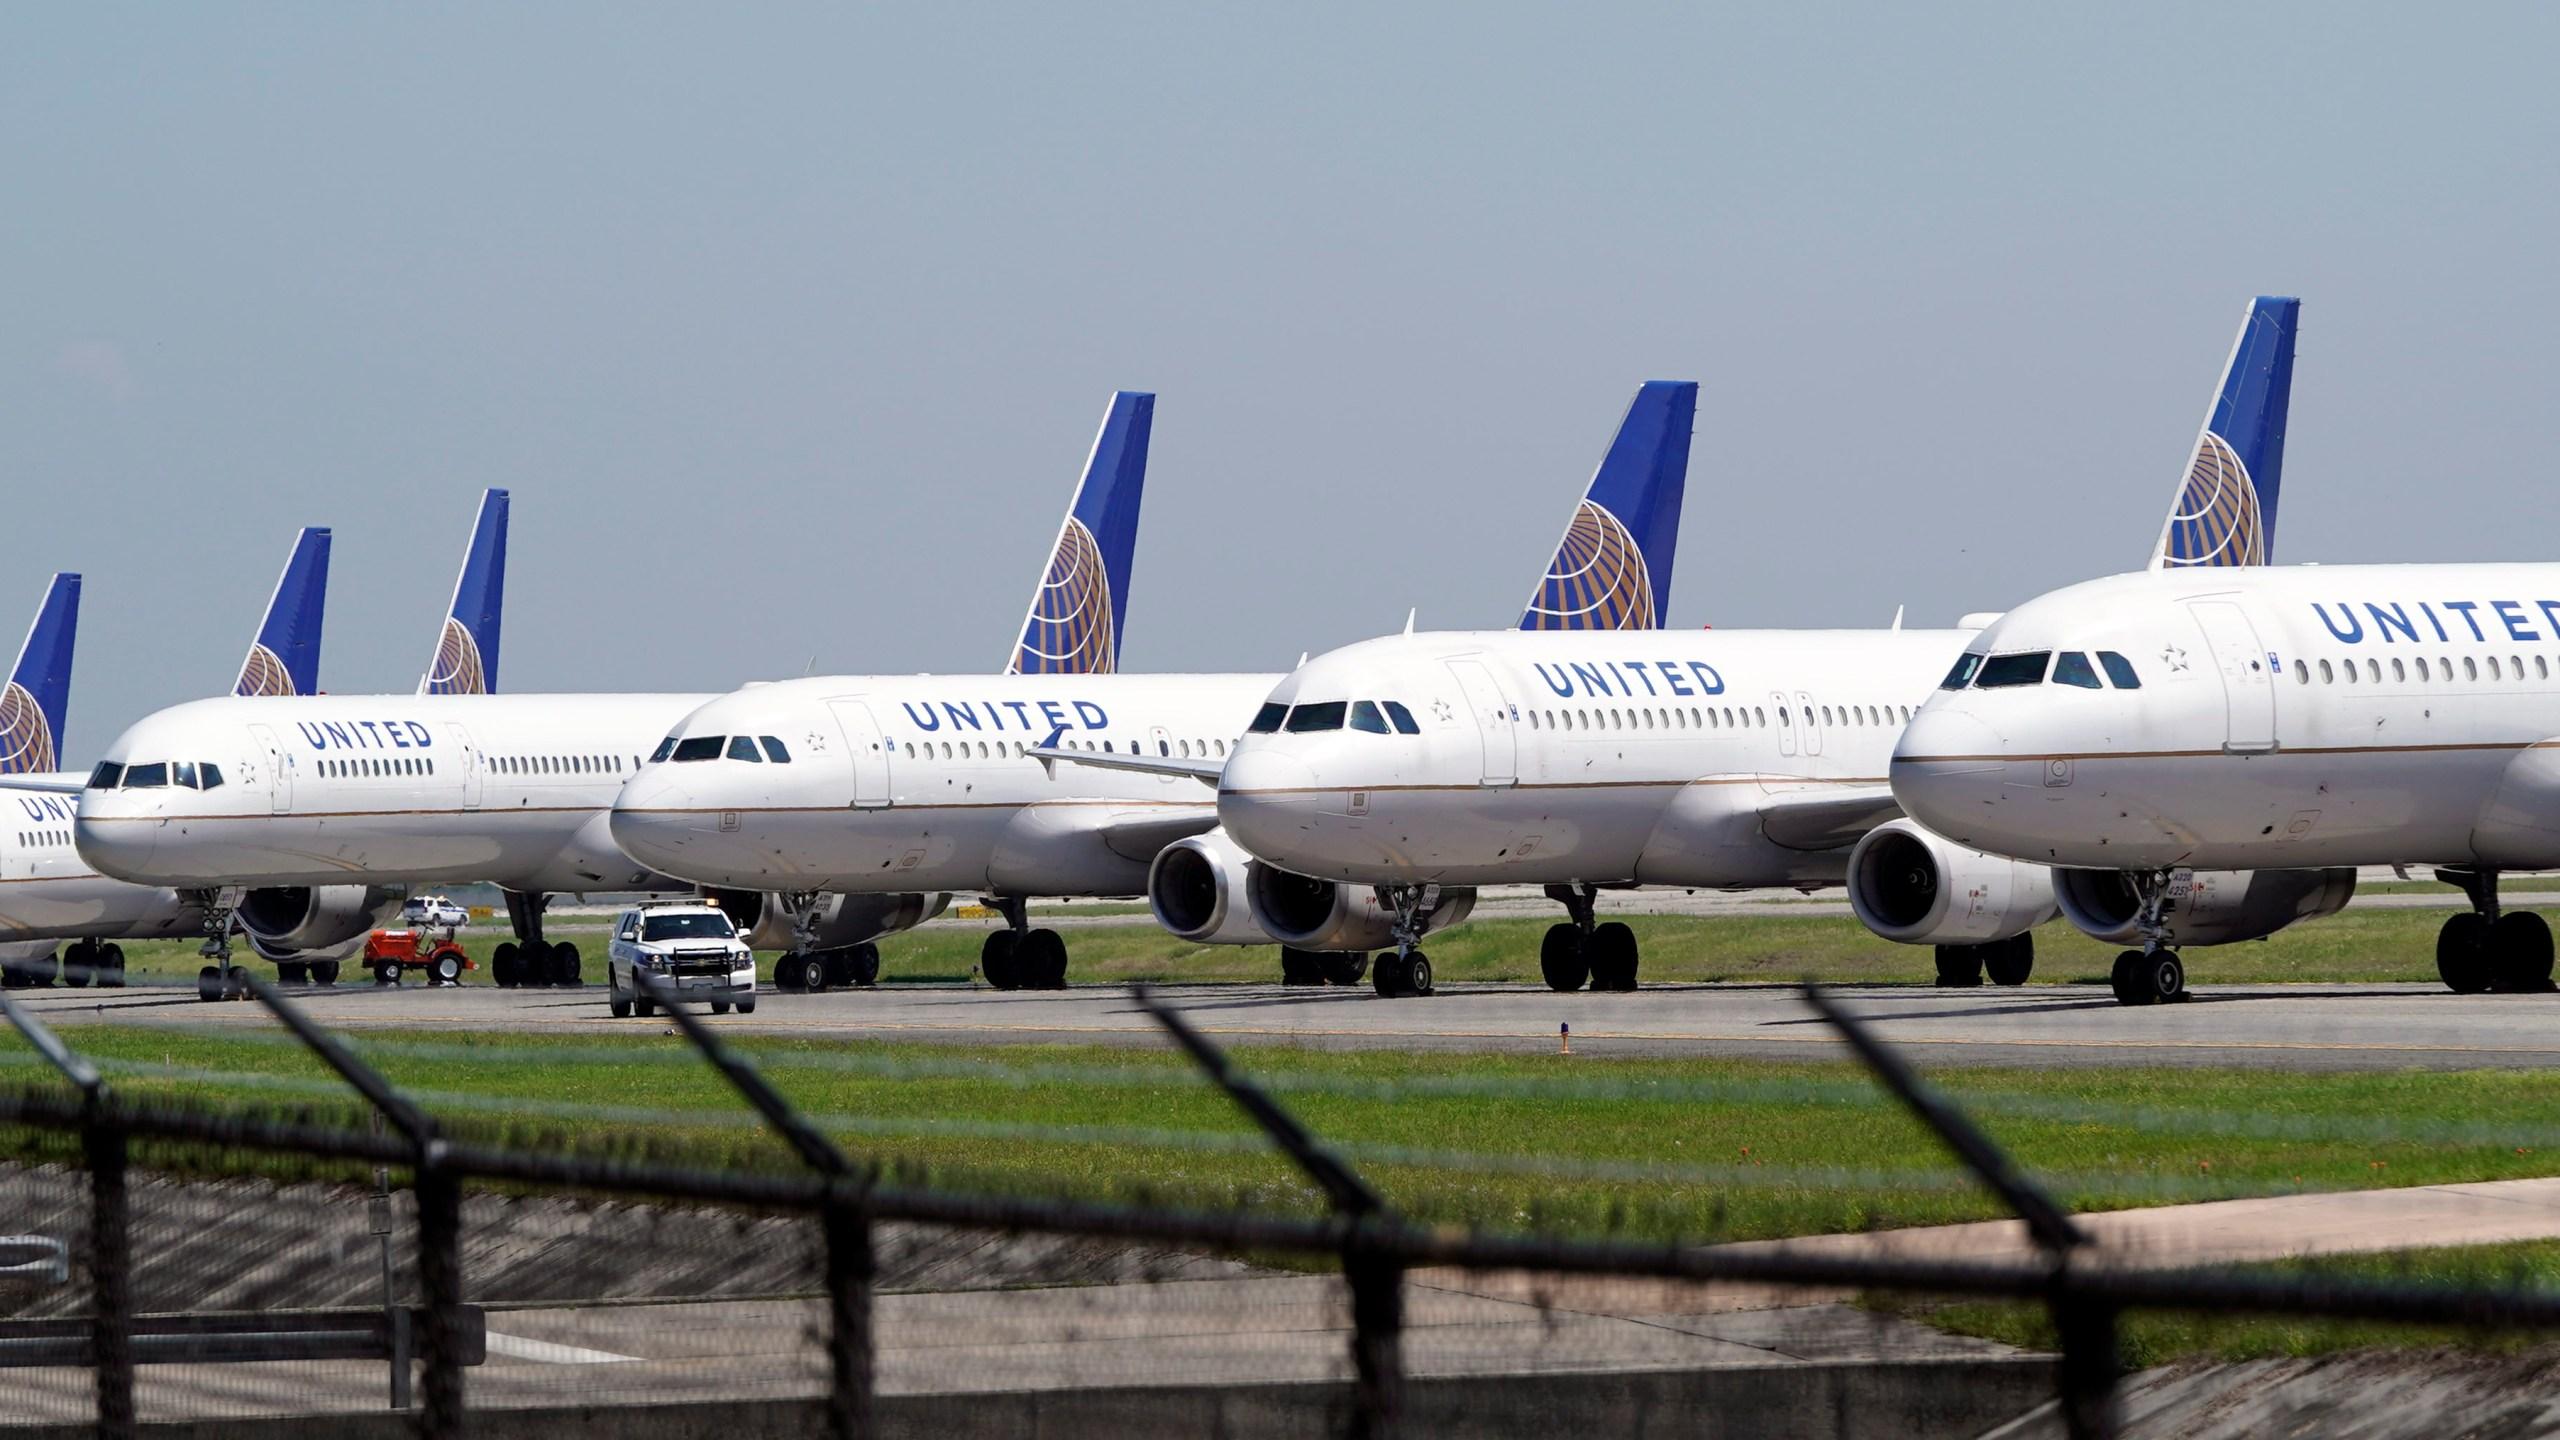 United Airelines planes